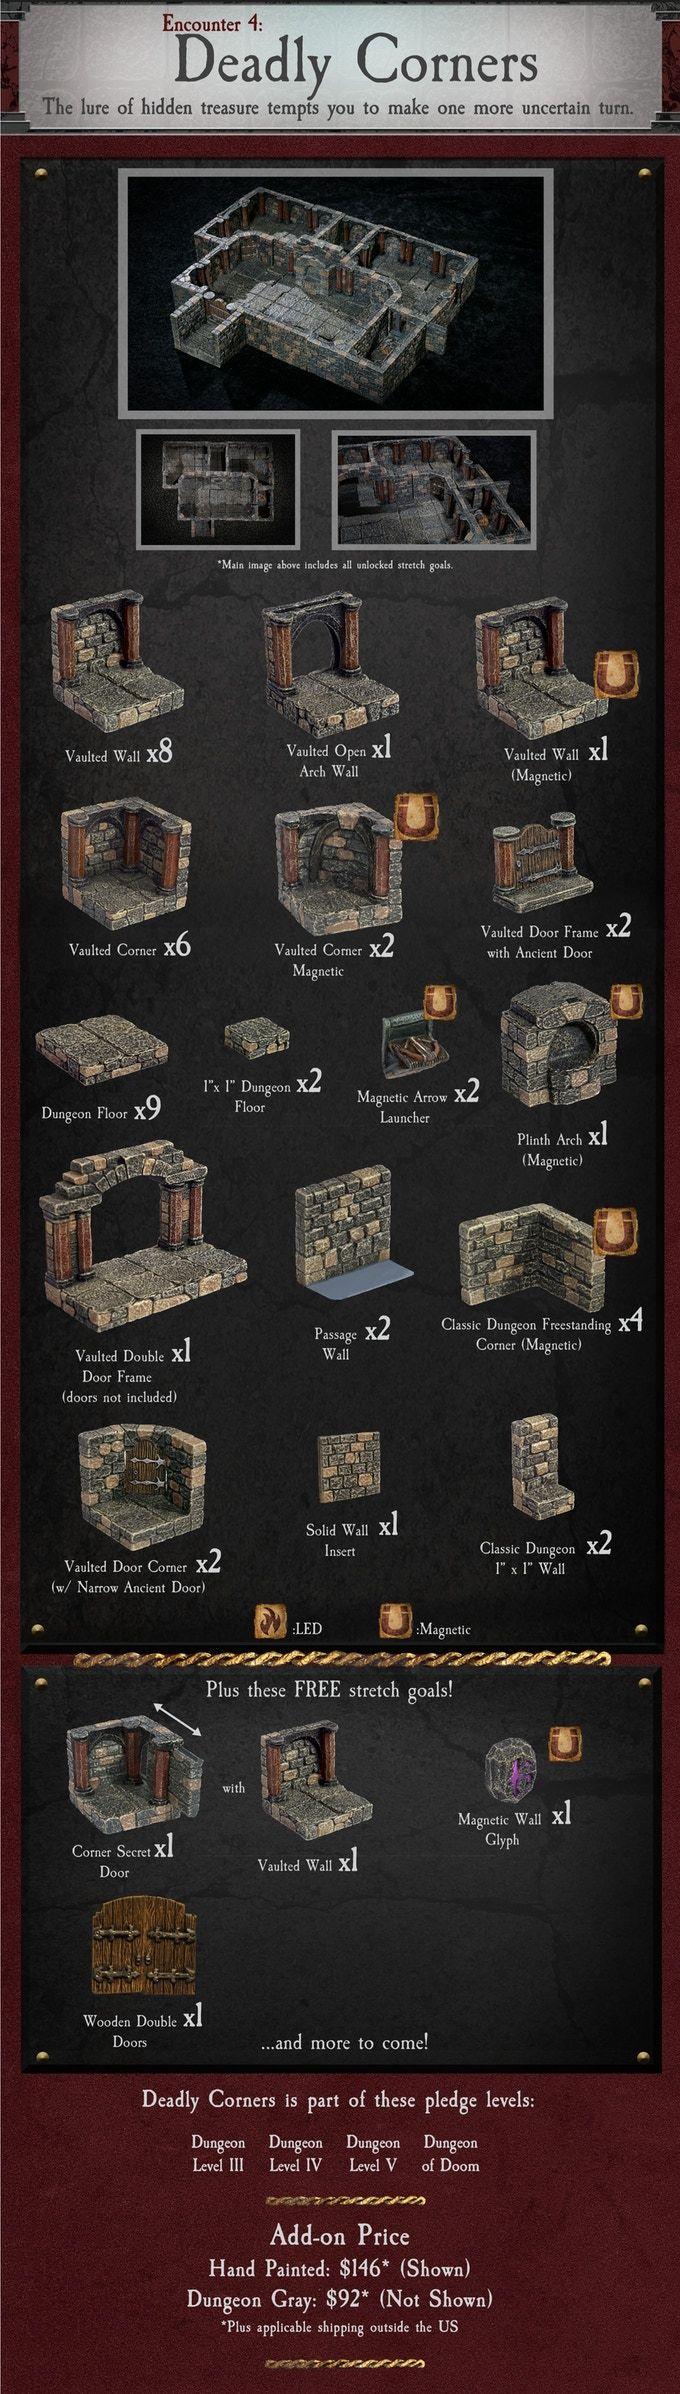 Dungeon of Doom: Handcrafted Game Terrain by Dwarven Forge by Dwarven Forge — Kickstarter